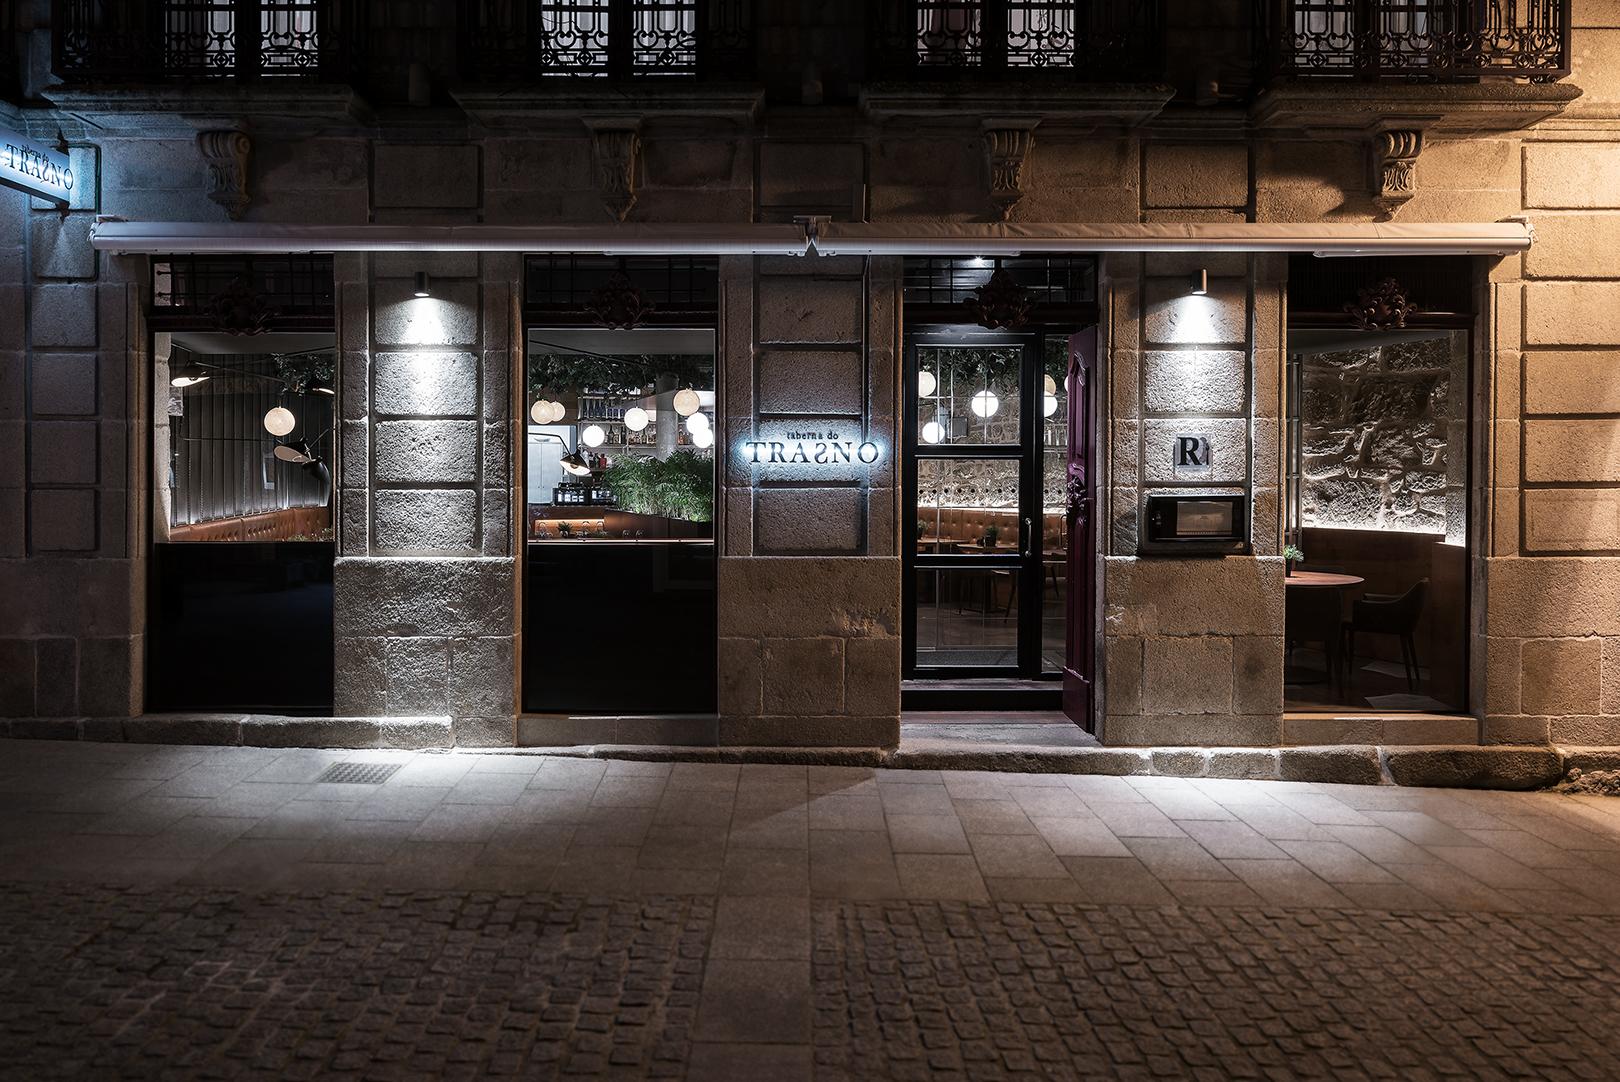 Galer A De Restaurante Taberna Do Trasno Nan Arquitectos 5